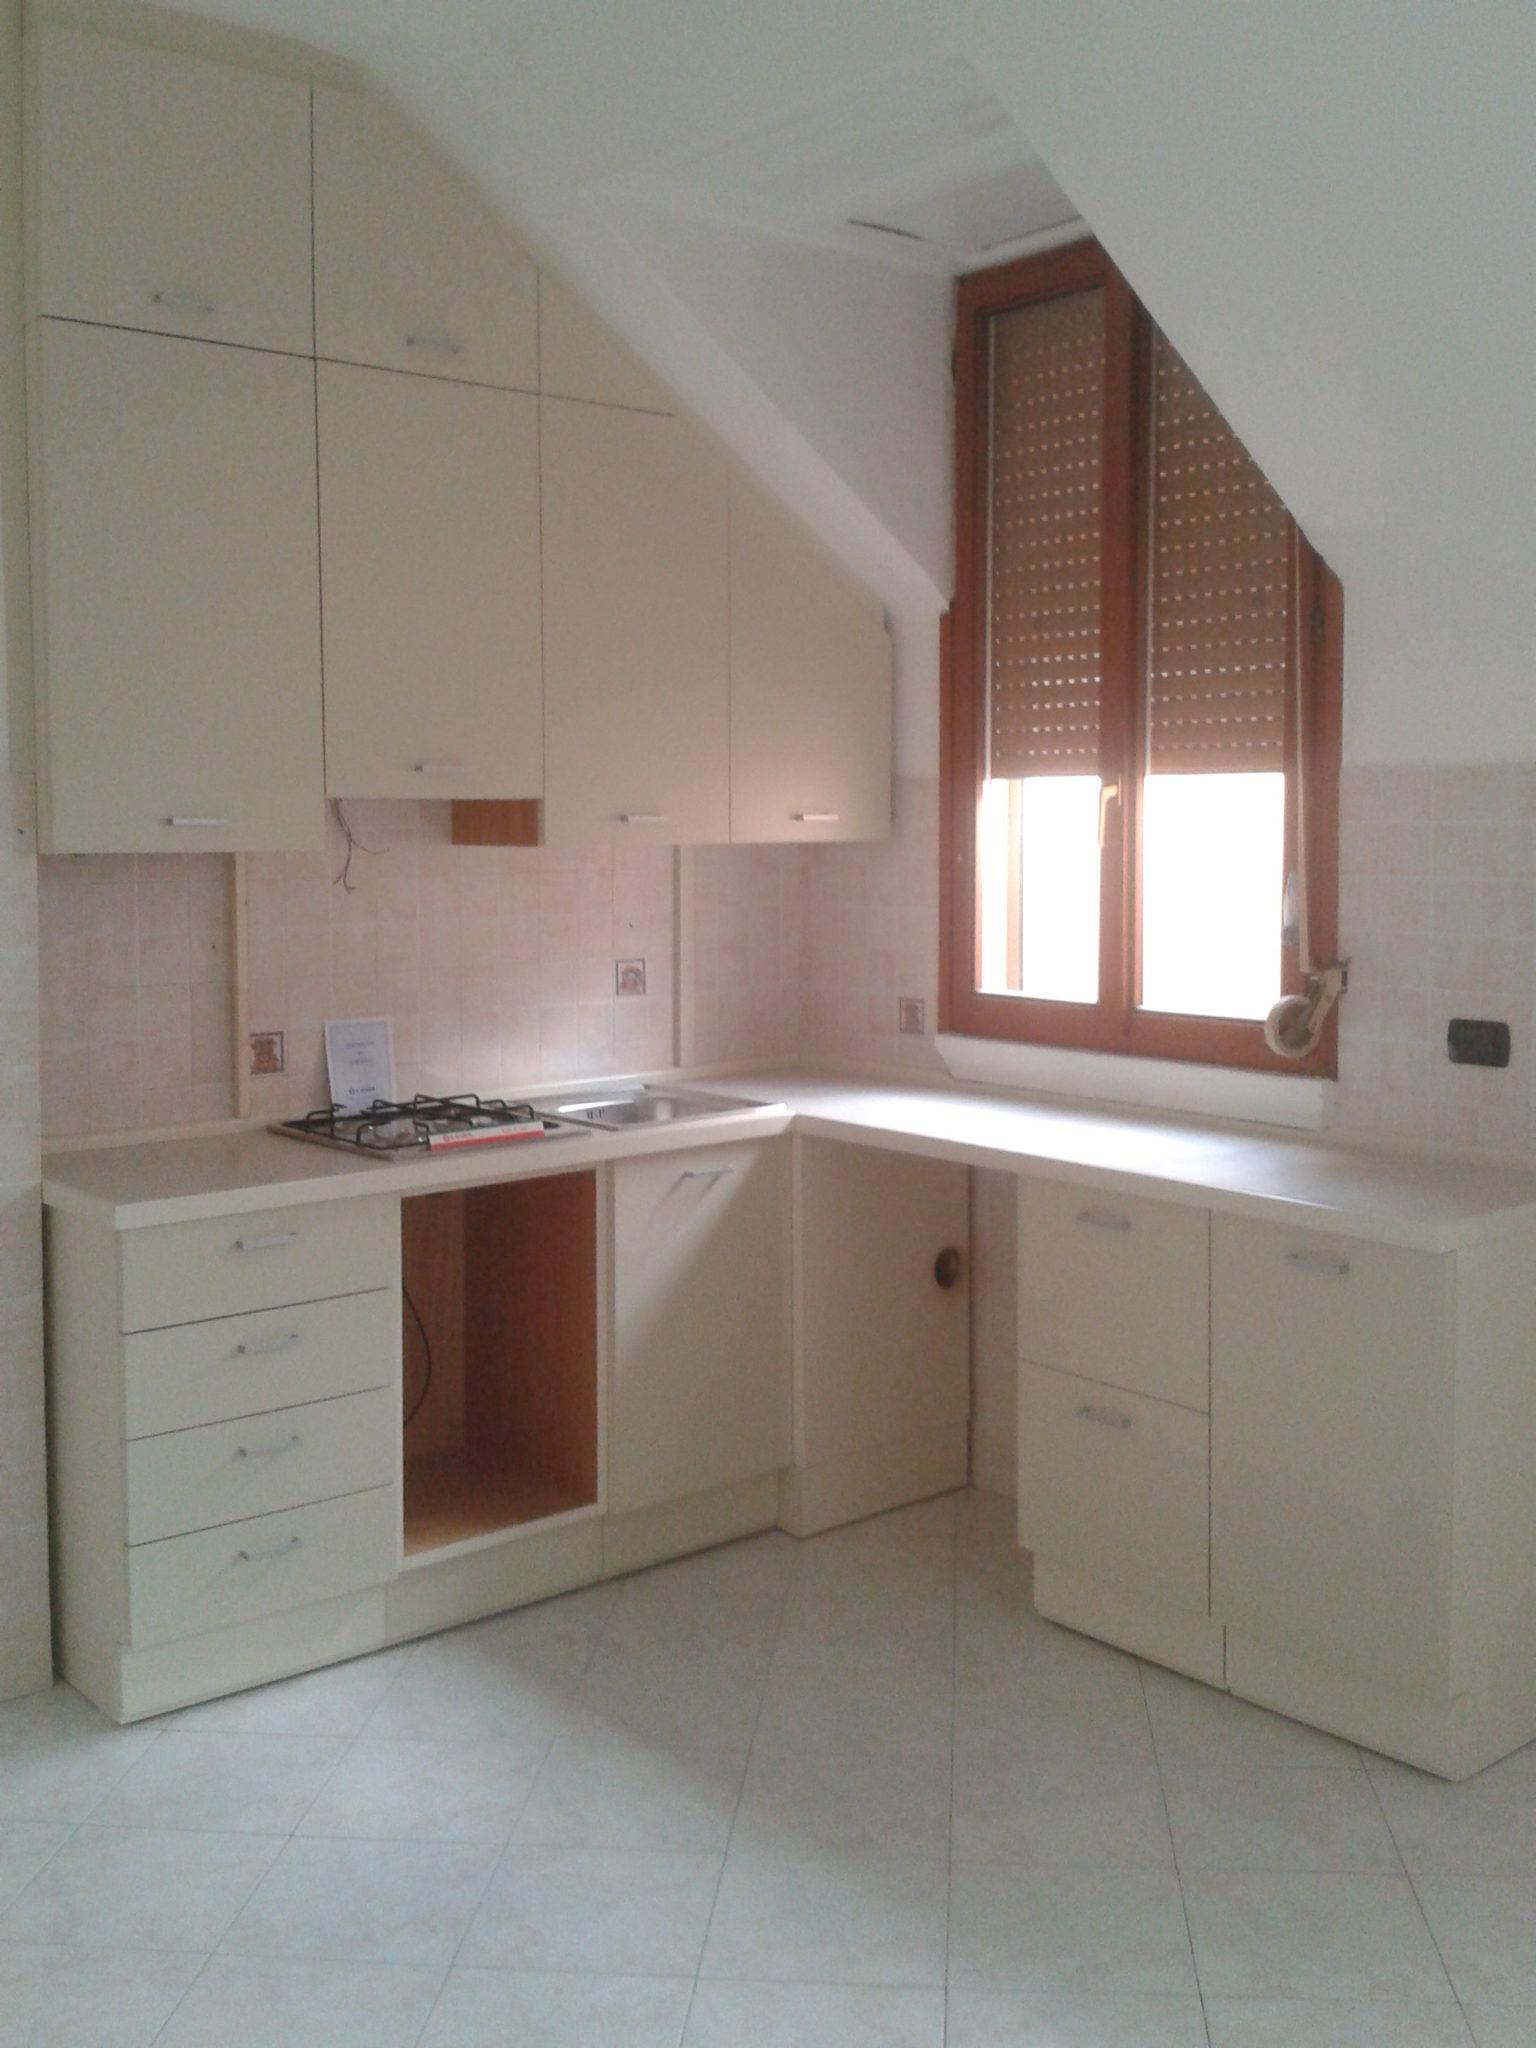 Cucina sottoscala creo casa milano progetta l 39 arredo cucina - Cucina su misura milano ...